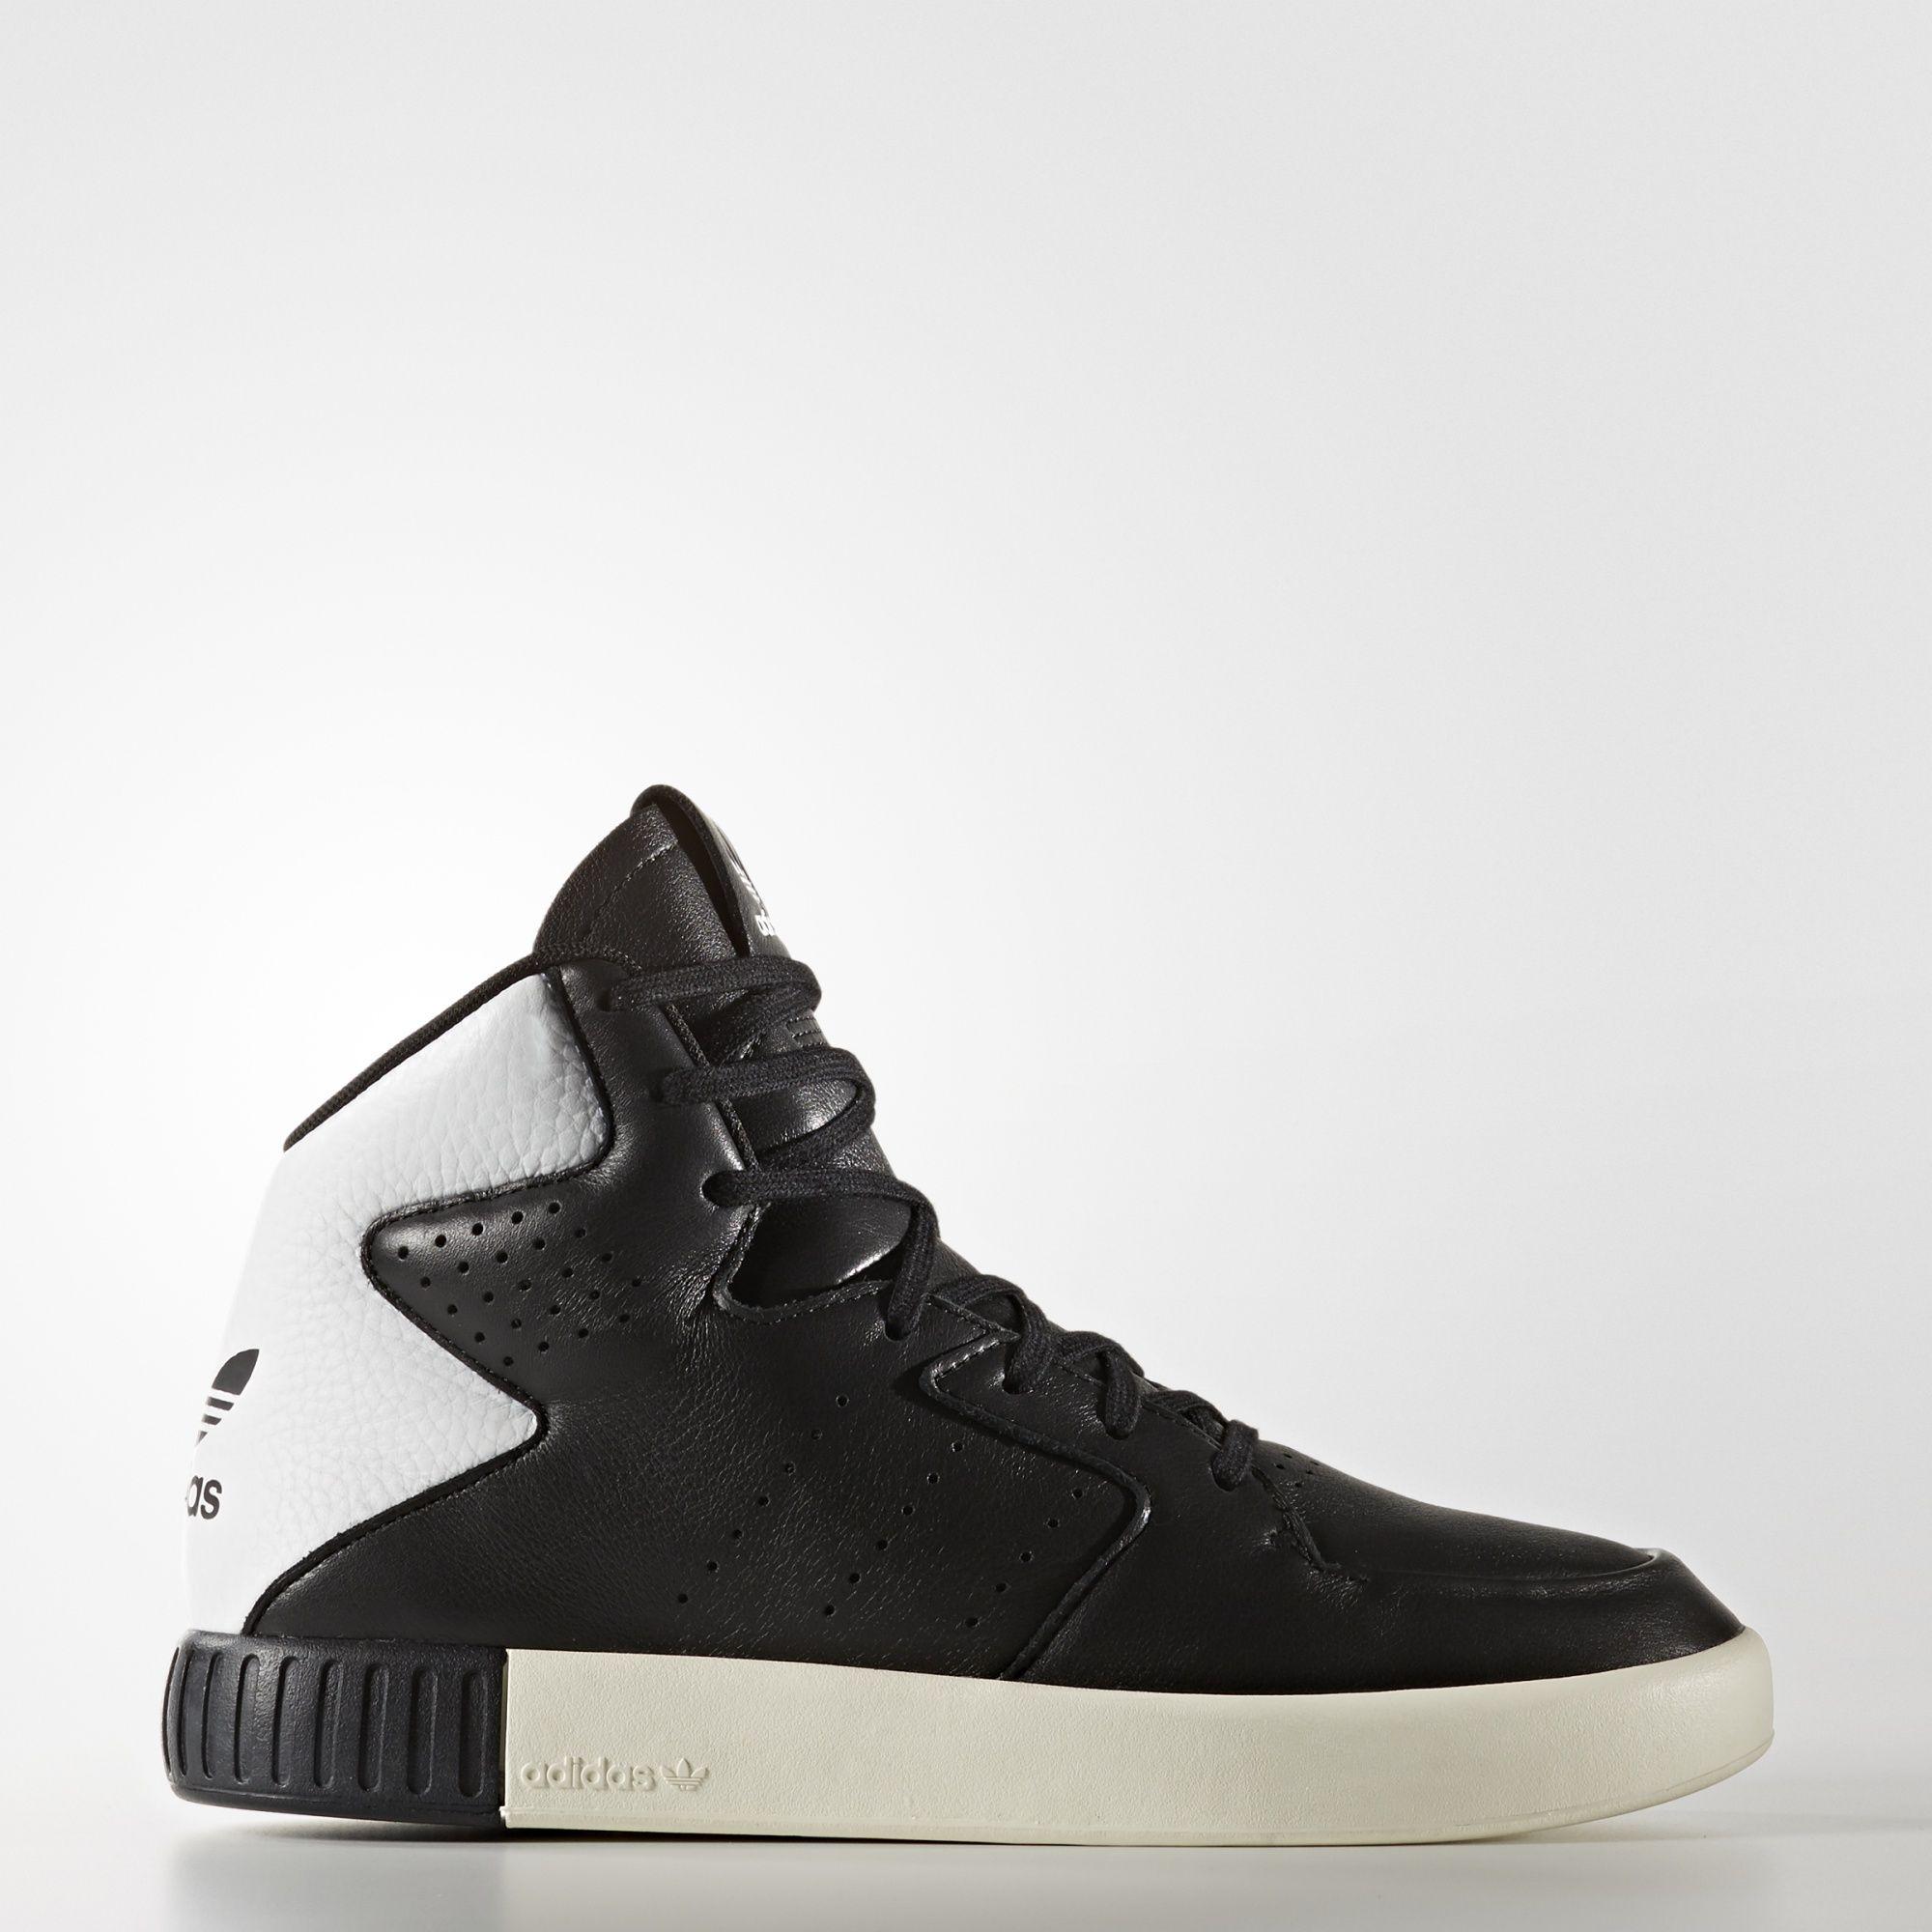 283eb40a Adidas originals tubular invader 2.0 | Shoes | Tubular shoes, Adidas ...